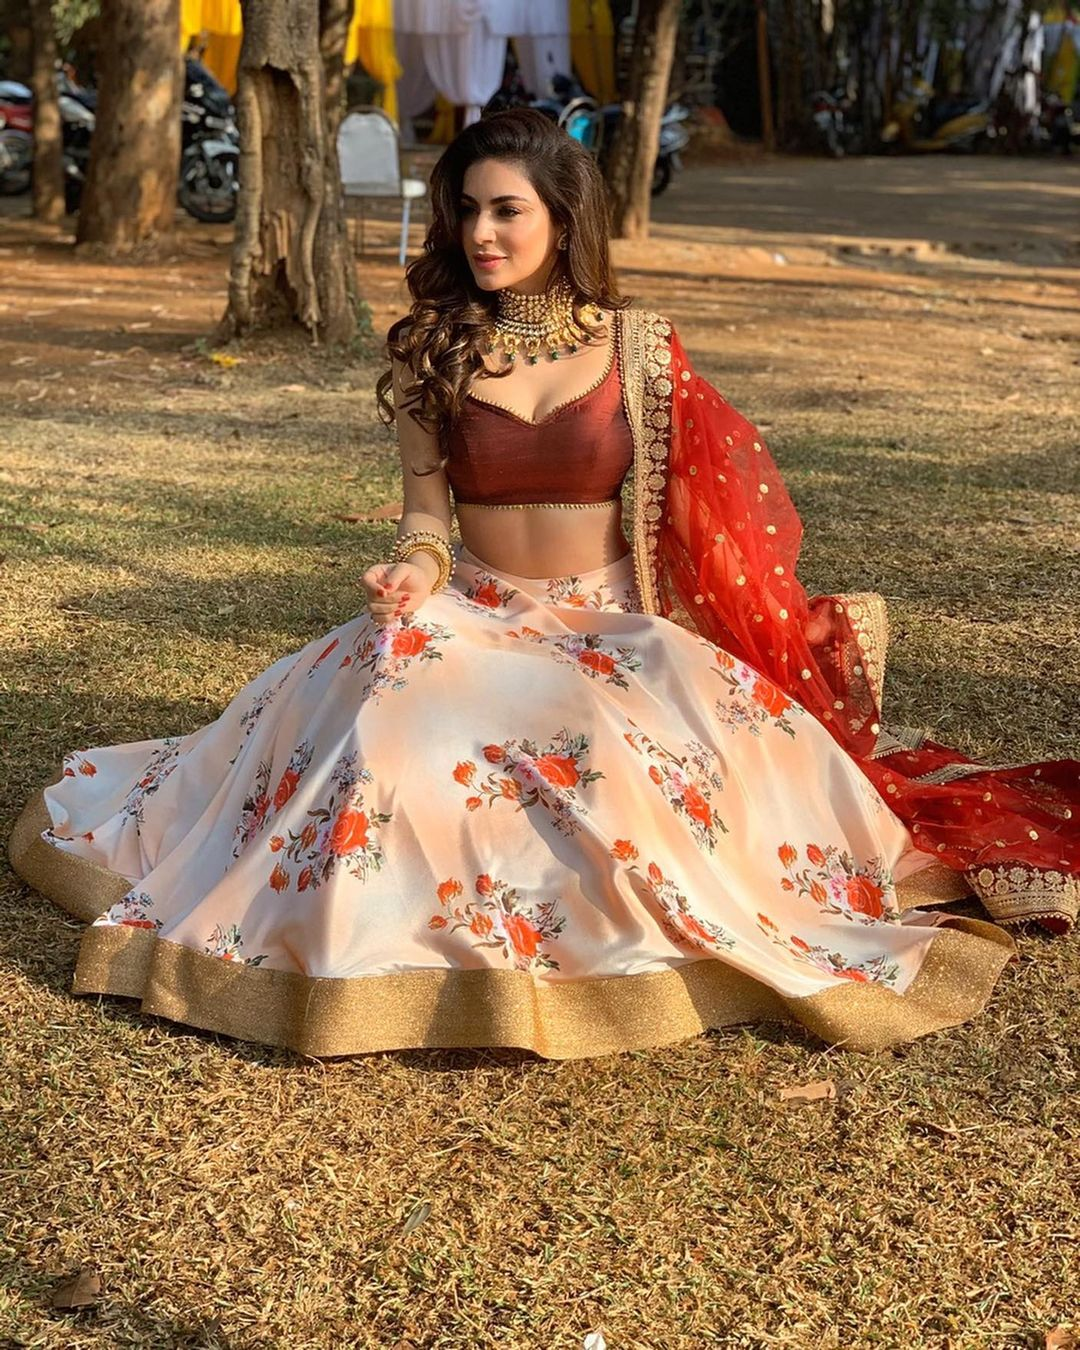 Shraddha Arya Vs Surbhi Chandna Vs Nia Sharma: Which Actress Has The Hottest Belly Curves? 2